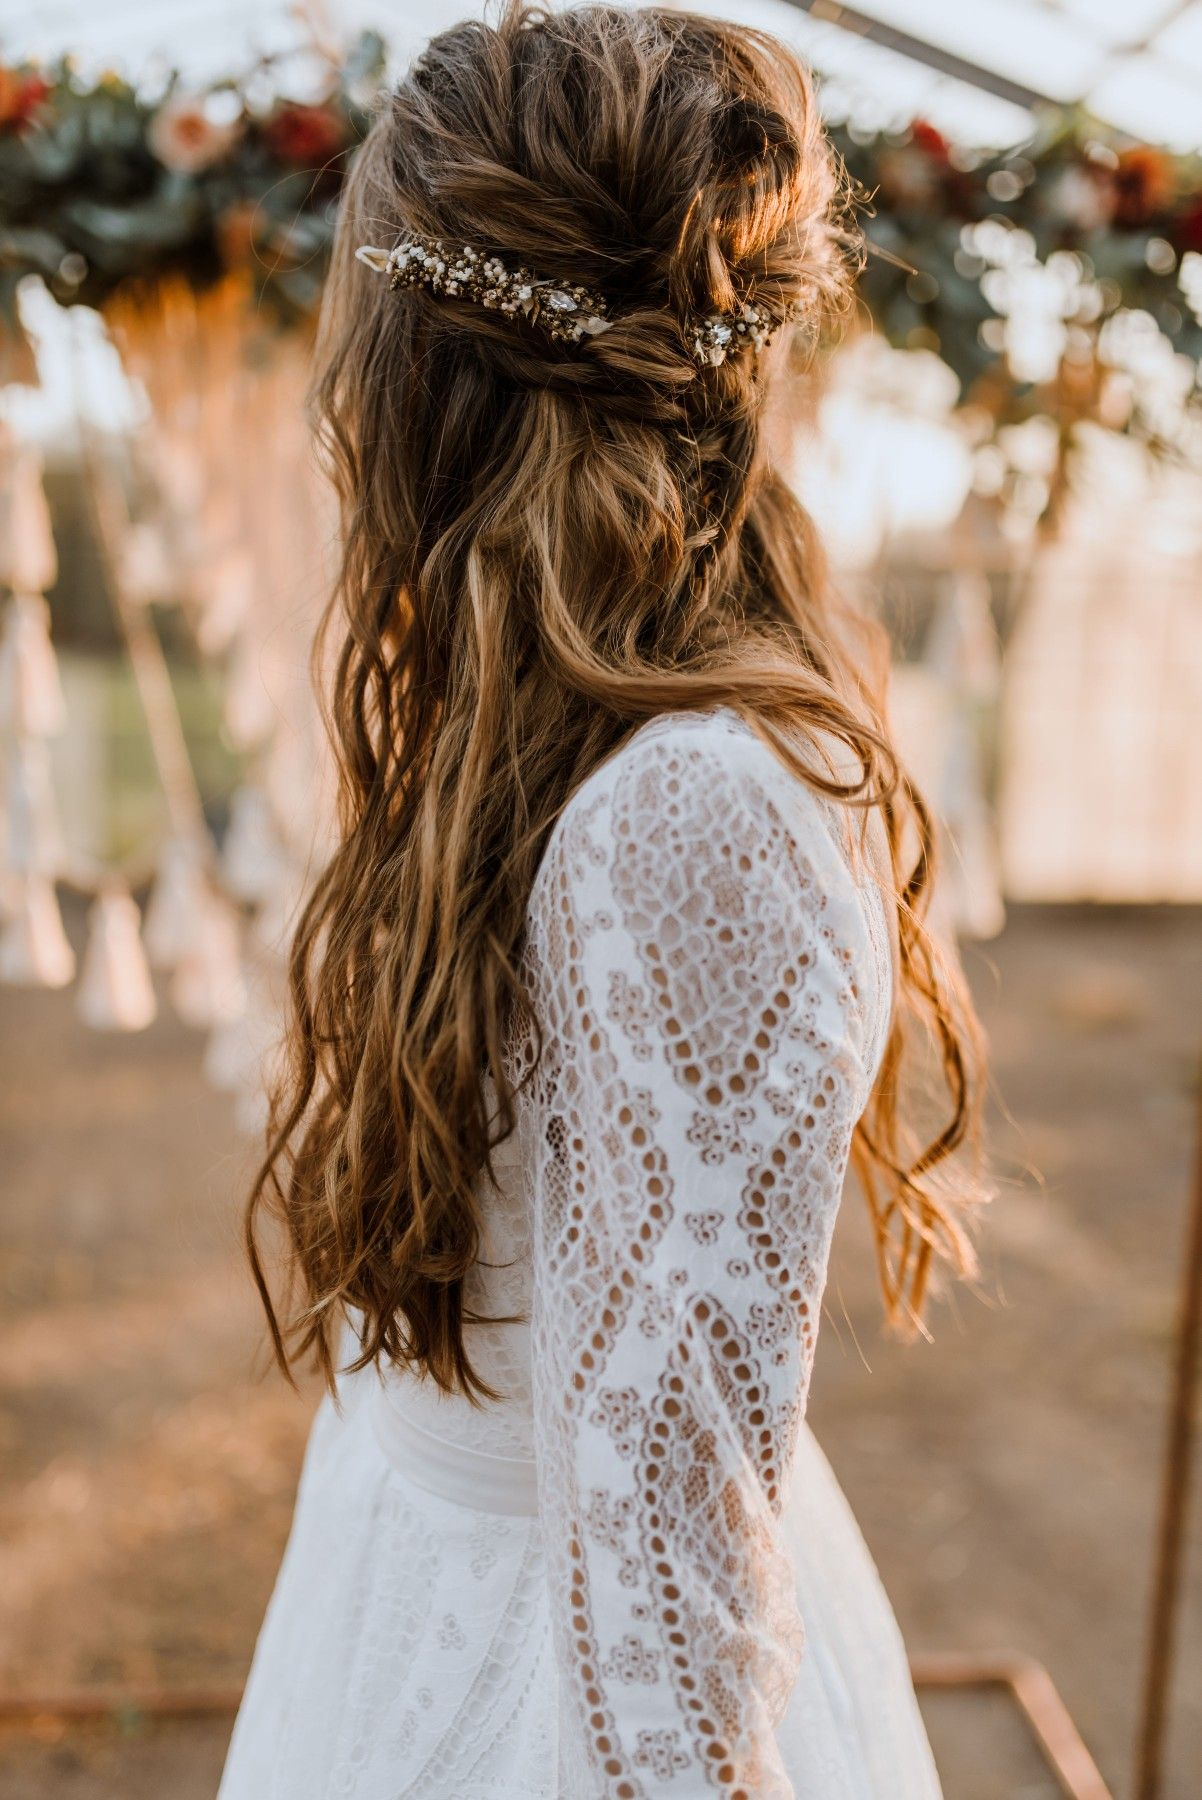 Labude Koeln Boho Bridal Hairstyle With Our Headpiece Chiara Bohemian Style Bridalinspiration With Mes Brautfrisur Brautjungfern Frisuren Brautfrisuren Boho